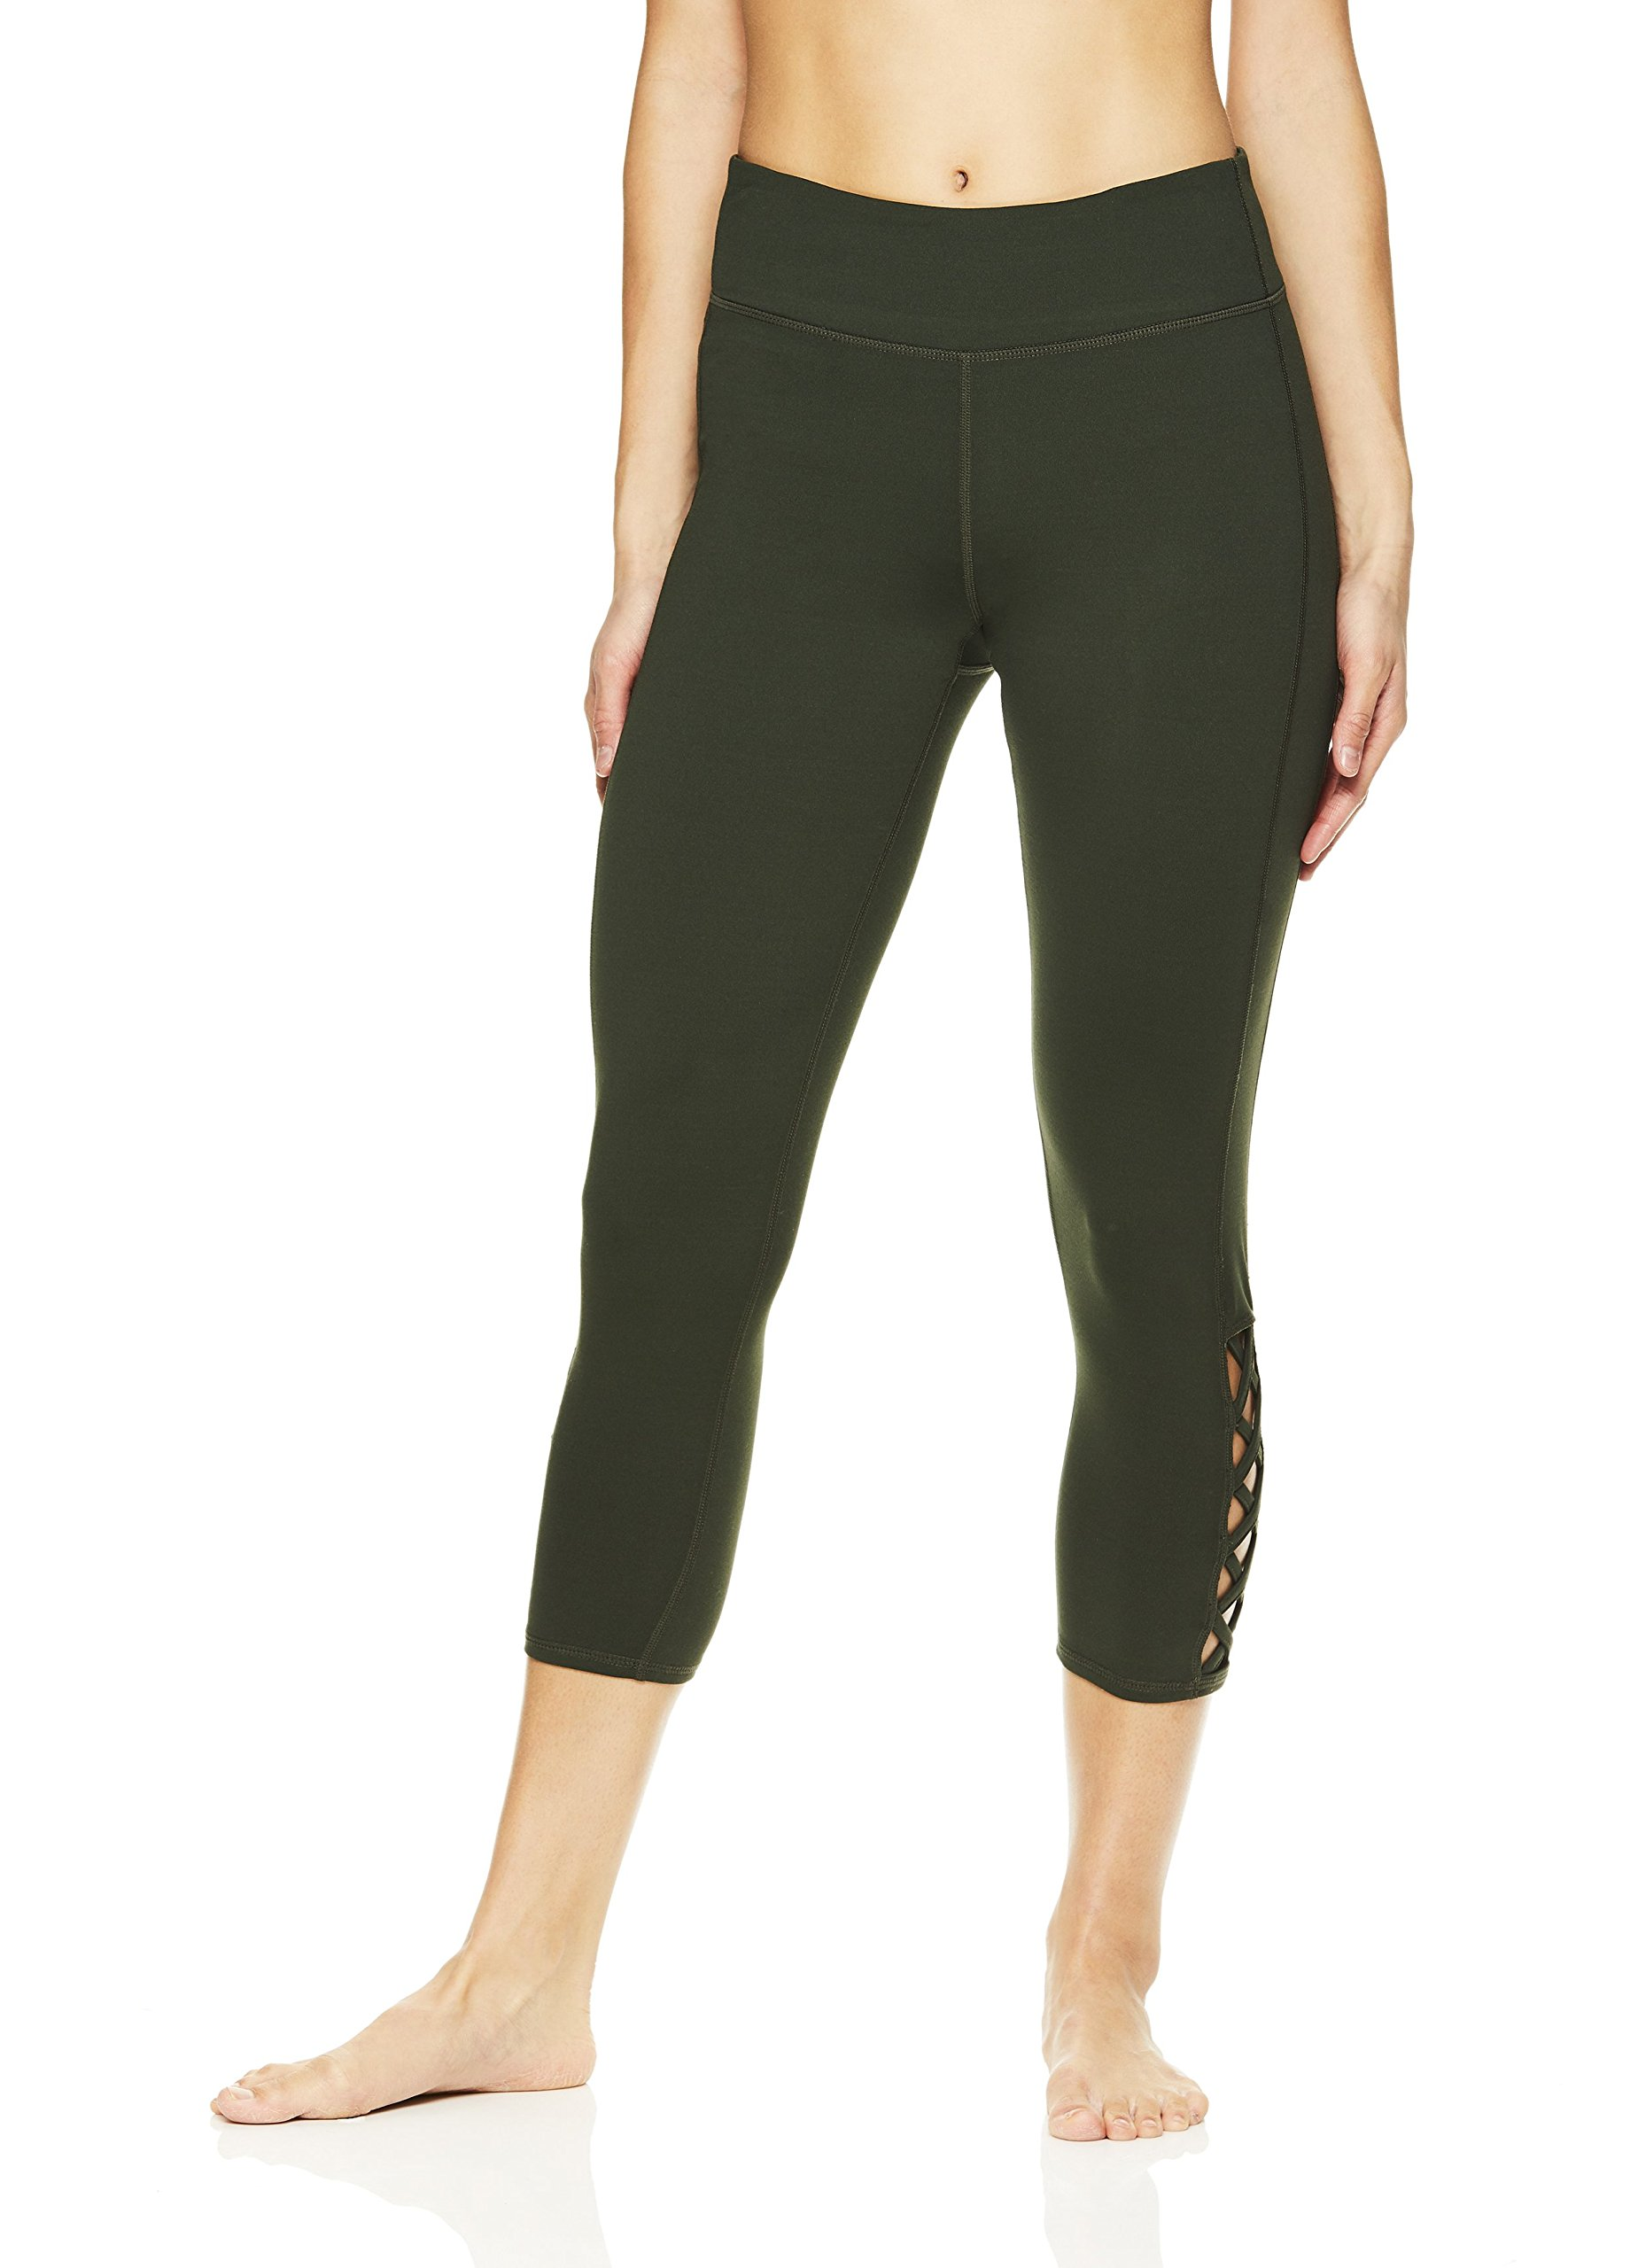 Gaiam Women's Capri Yoga Pants - Performance Spandex Compression Legging - Dufflebag, 3X by Gaiam (Image #3)